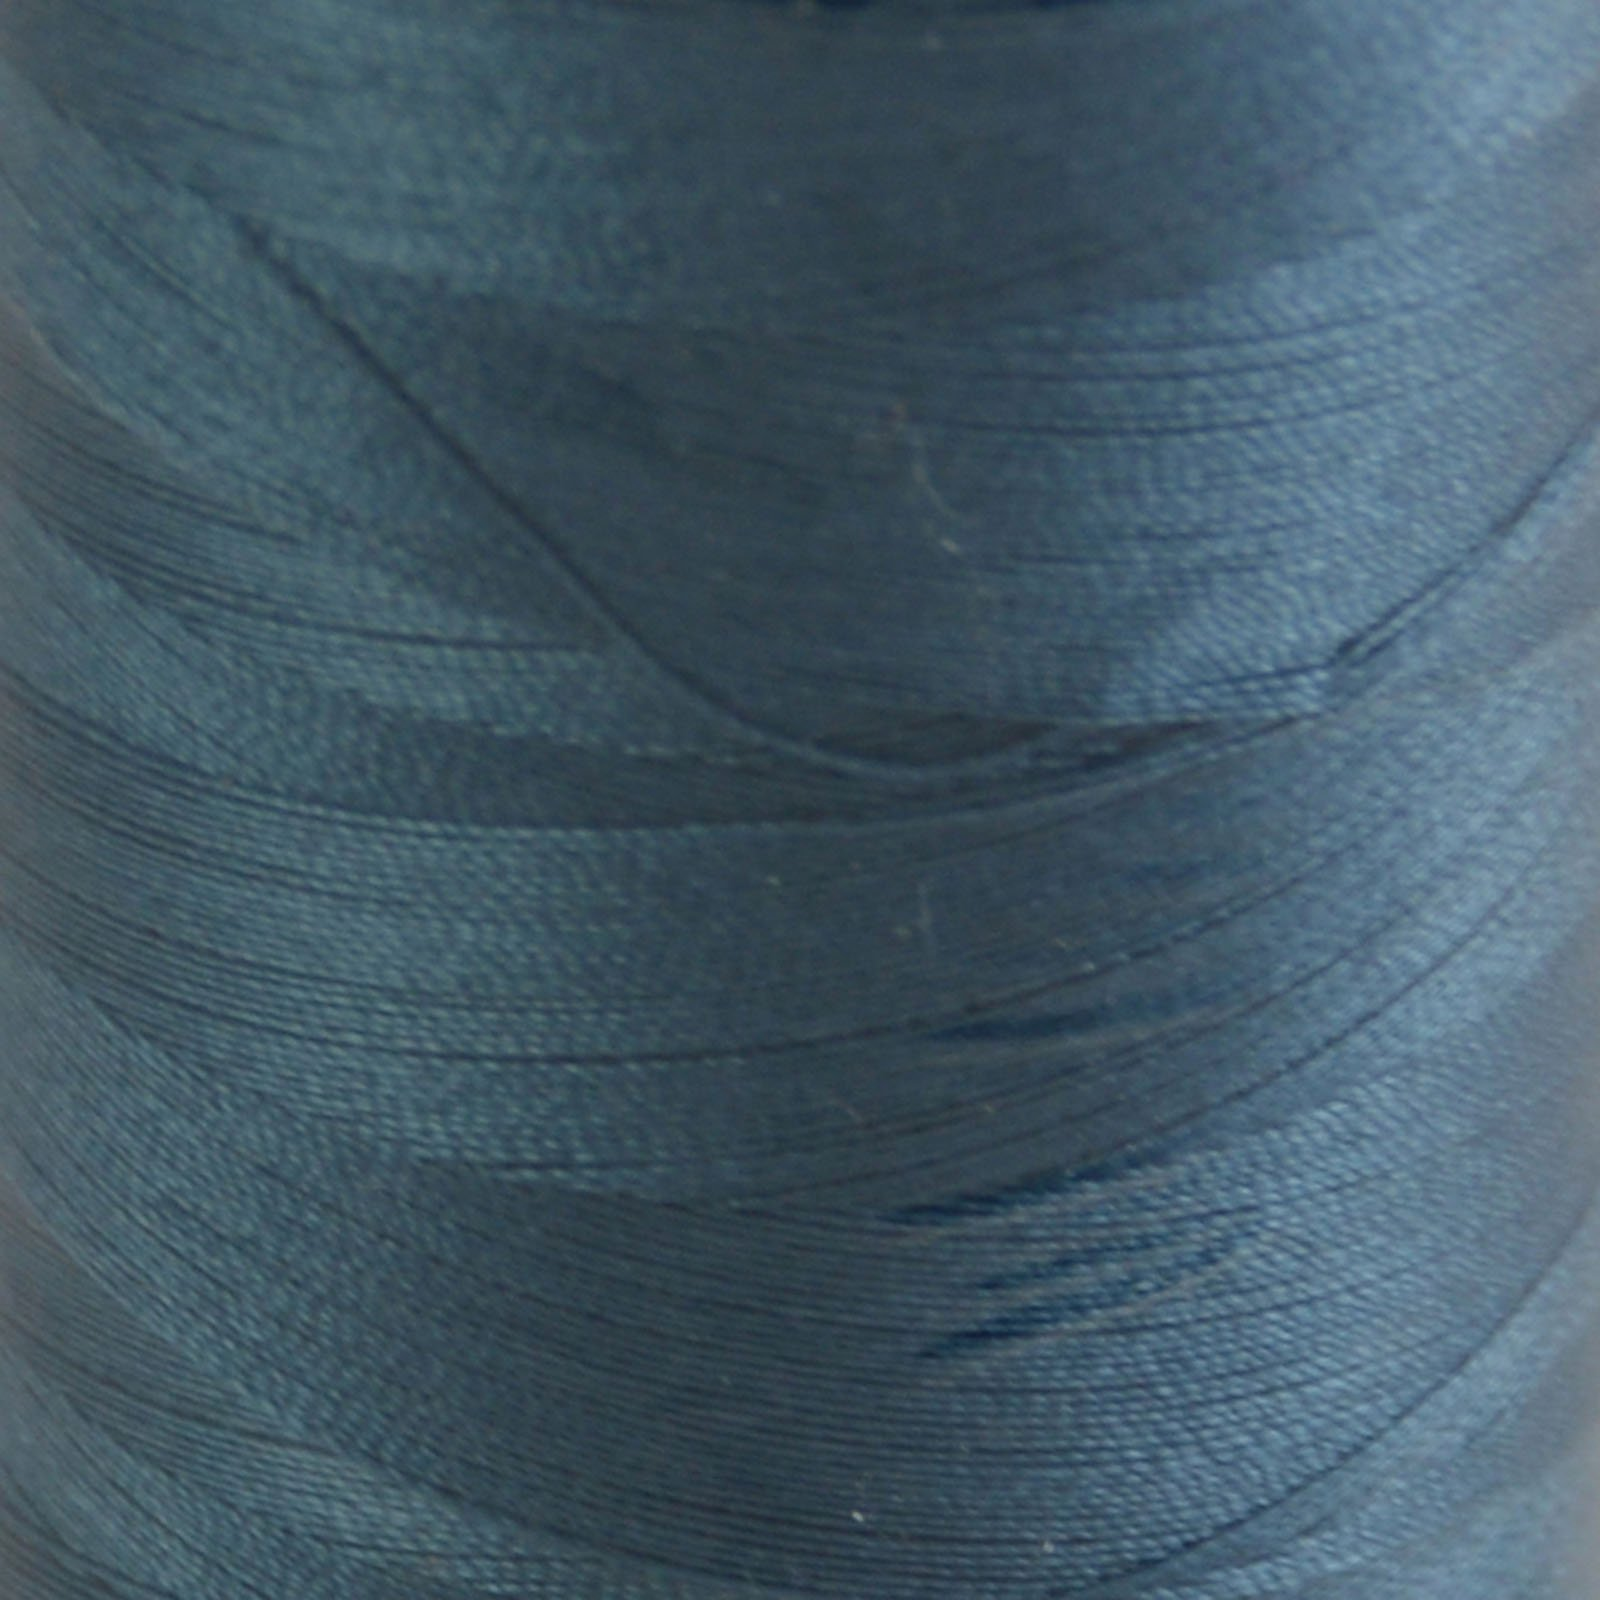 # 4644 Smoke Blue